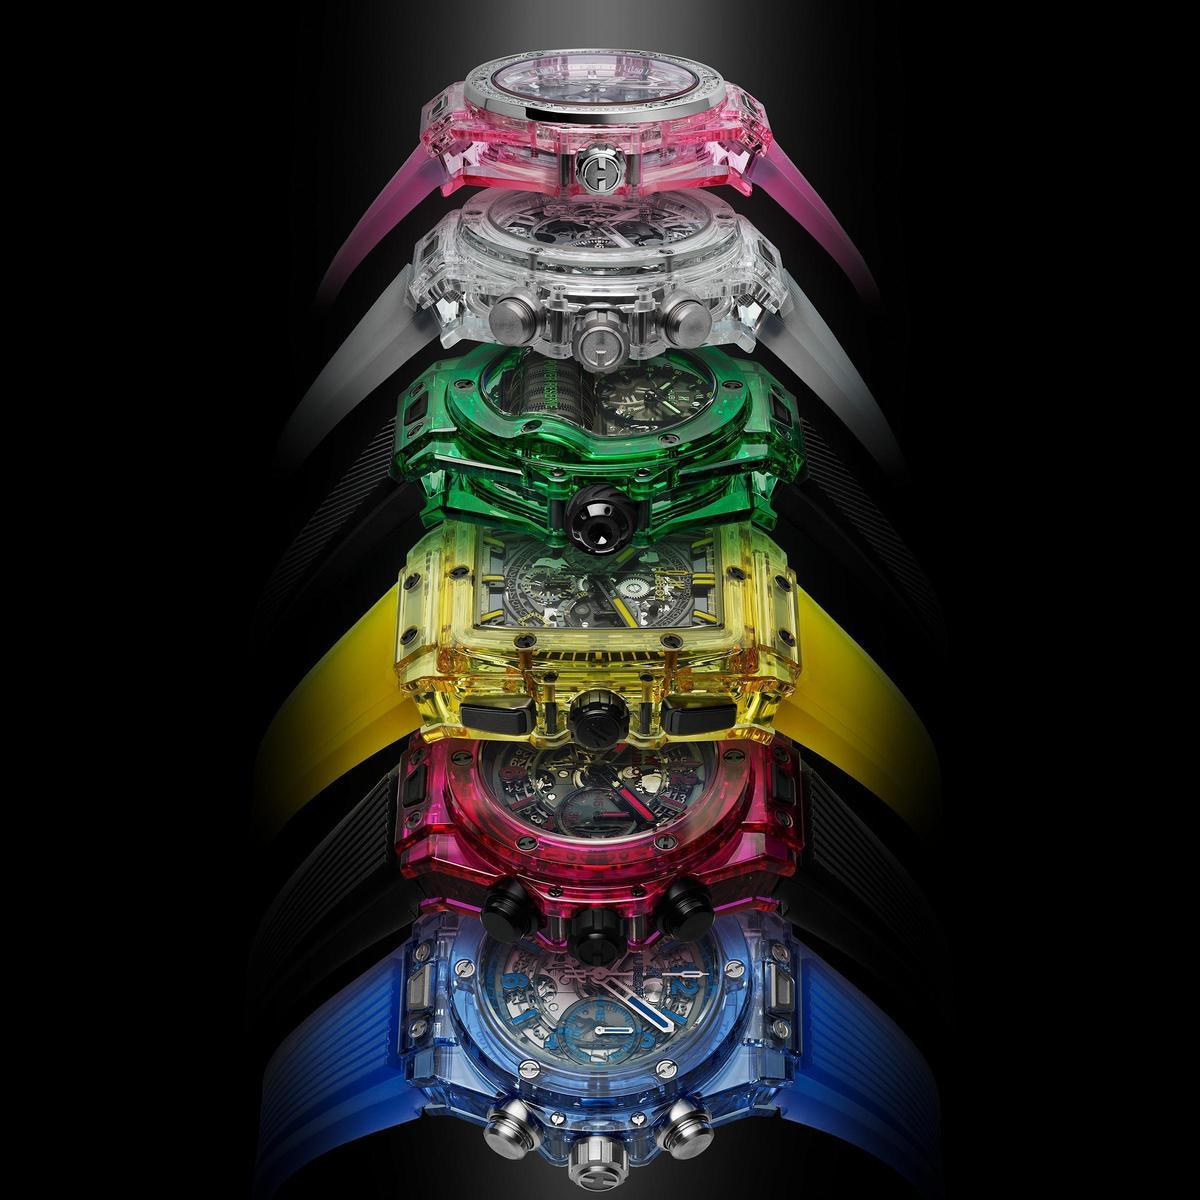 HUBLOT堪稱近代材質發明家,從最初透明藍寶石水晶錶殼開始,變化出不同色調選擇。